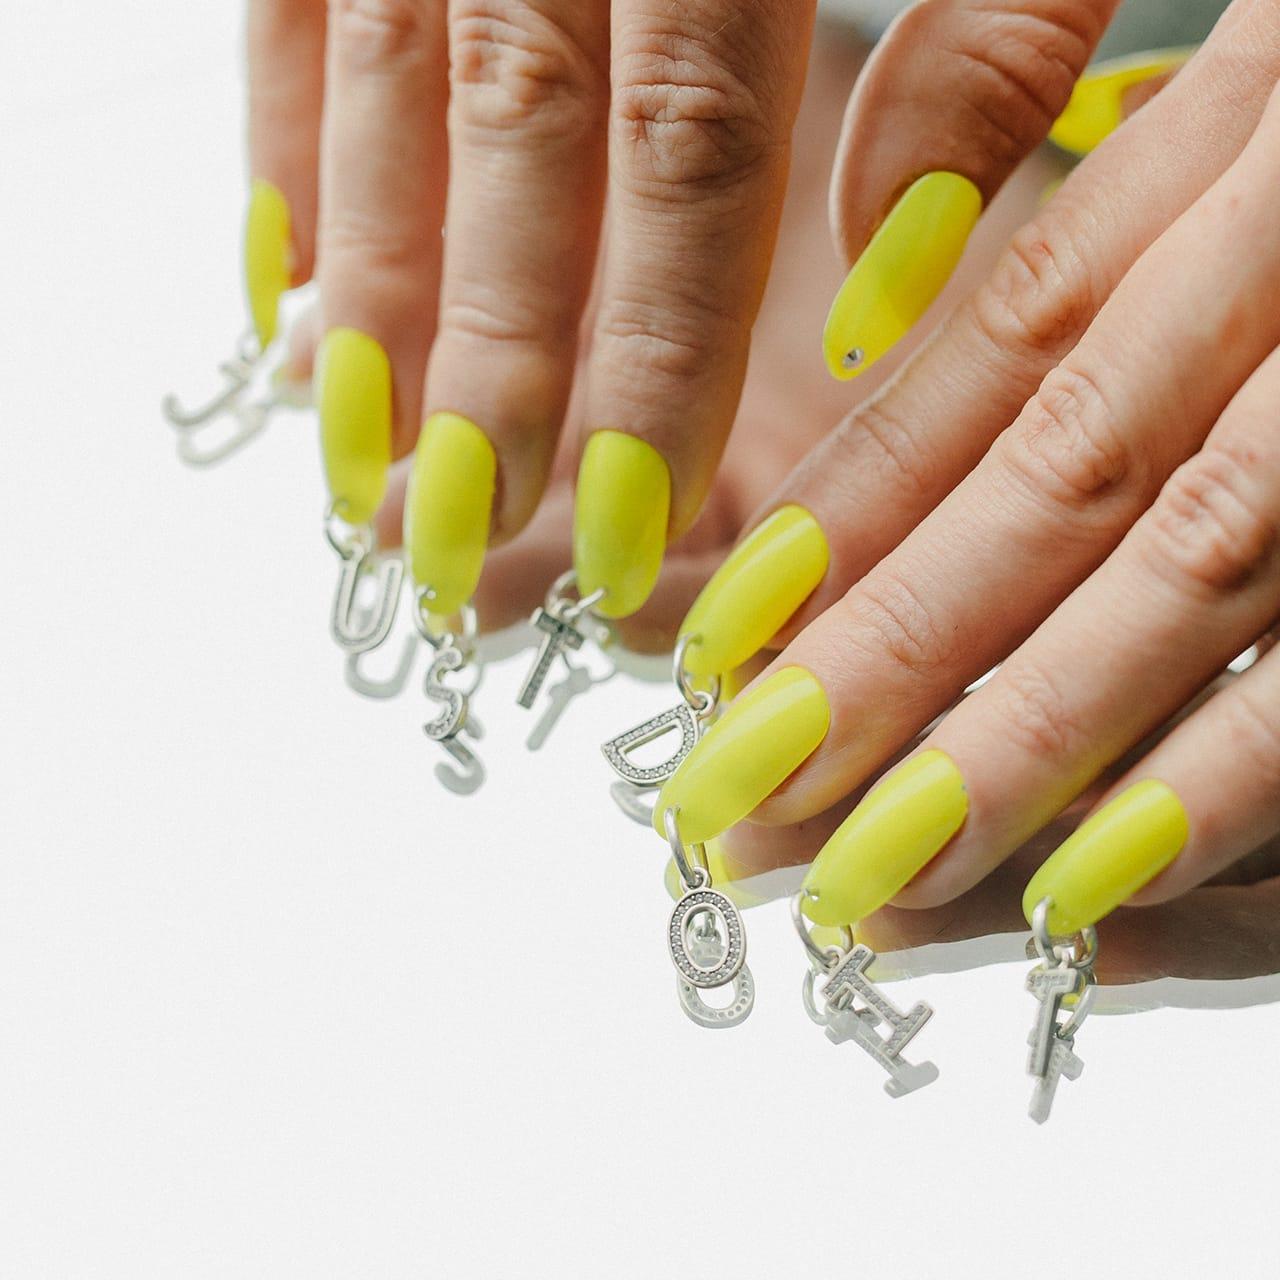 Jessica Washick Nike Af1 Designer Nail Artist Hypebae